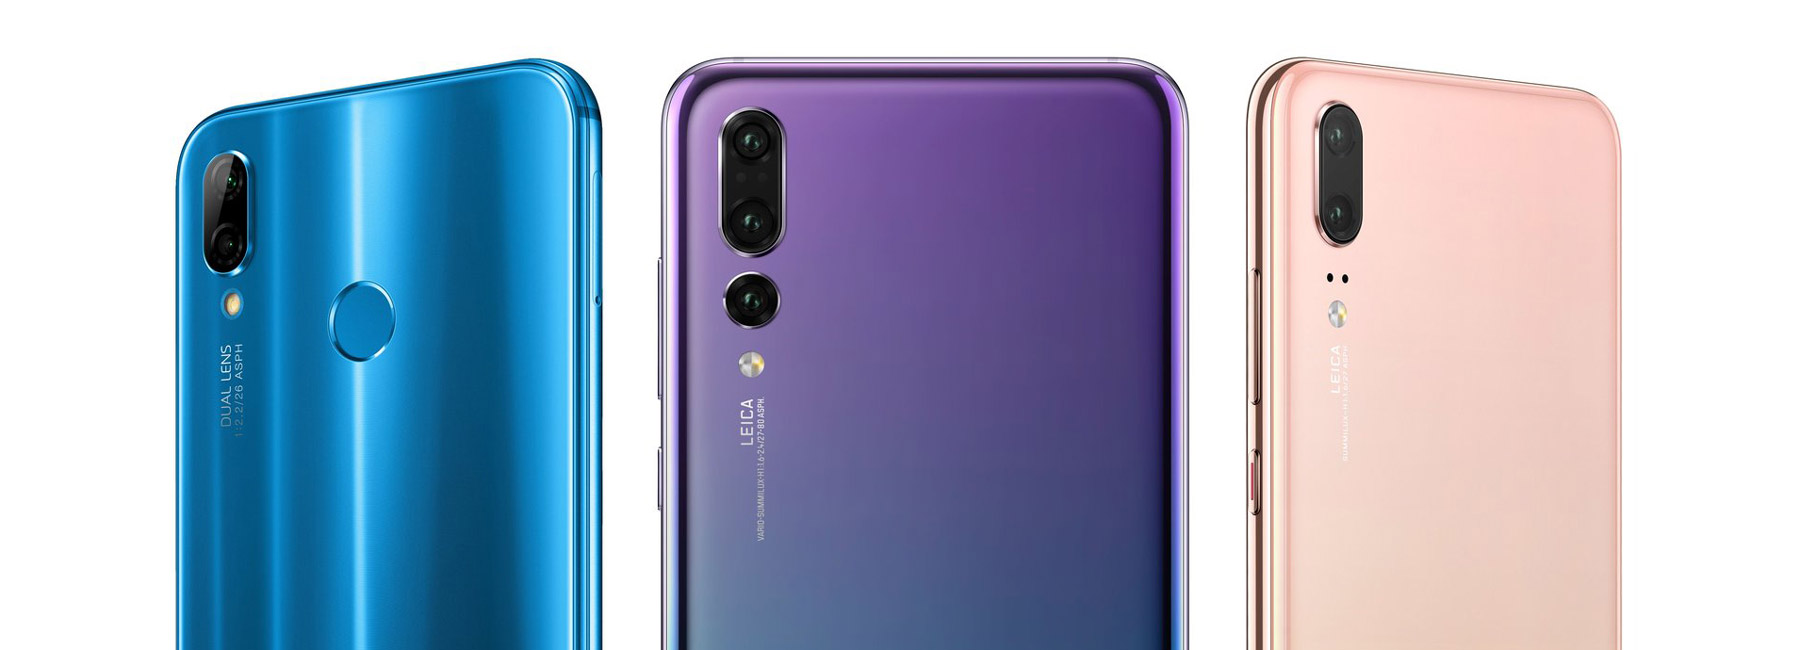 huawei-phone-leak-p20-pro-lite-colours-designboom-1800